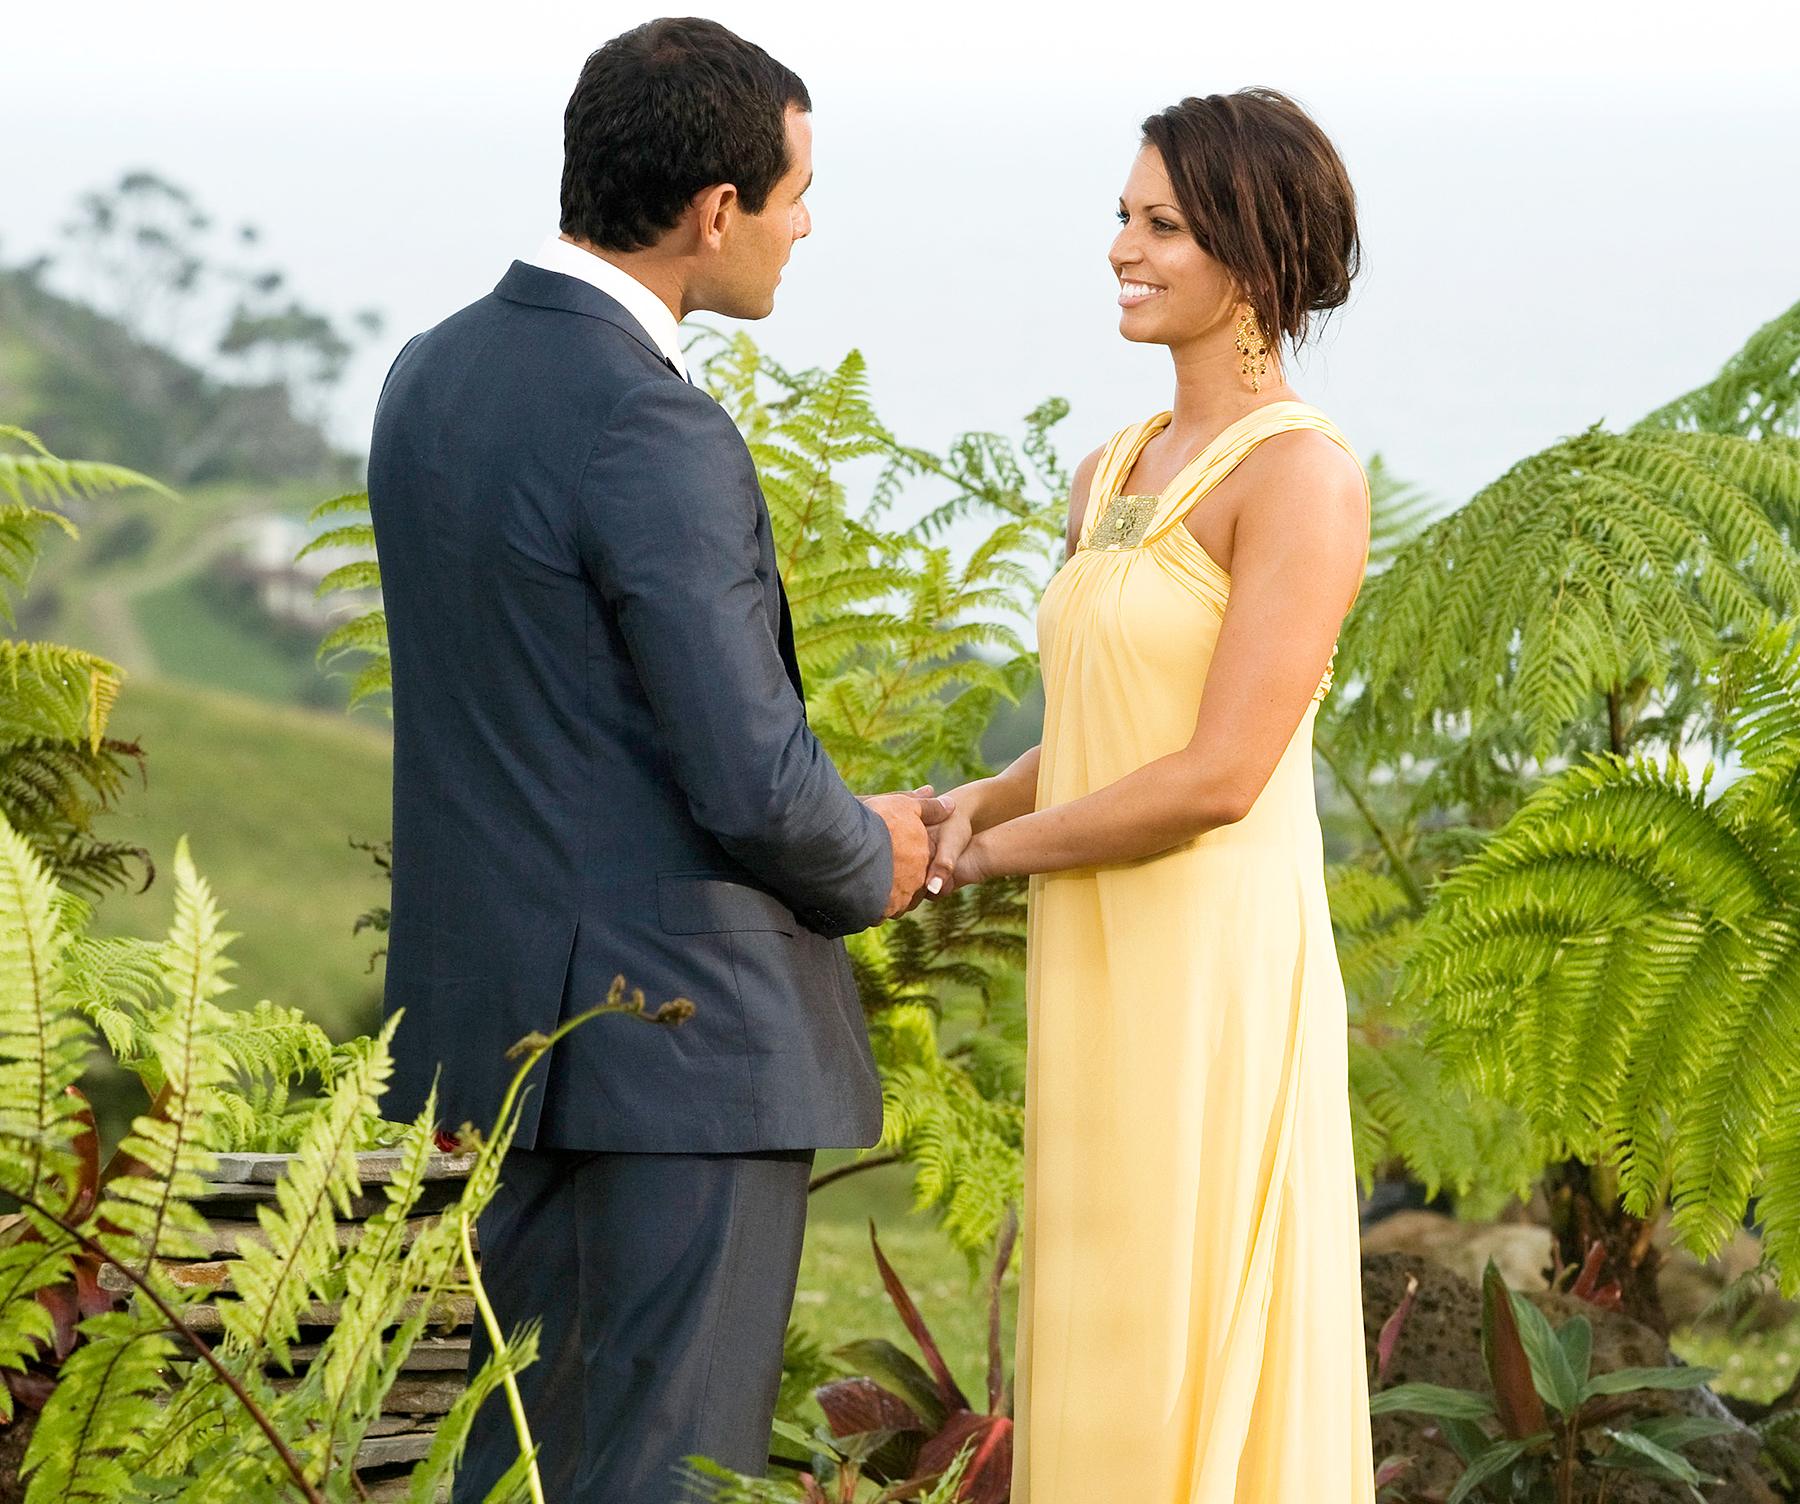 Jason Mesnick and Melissa Rycroft on The Bachelor